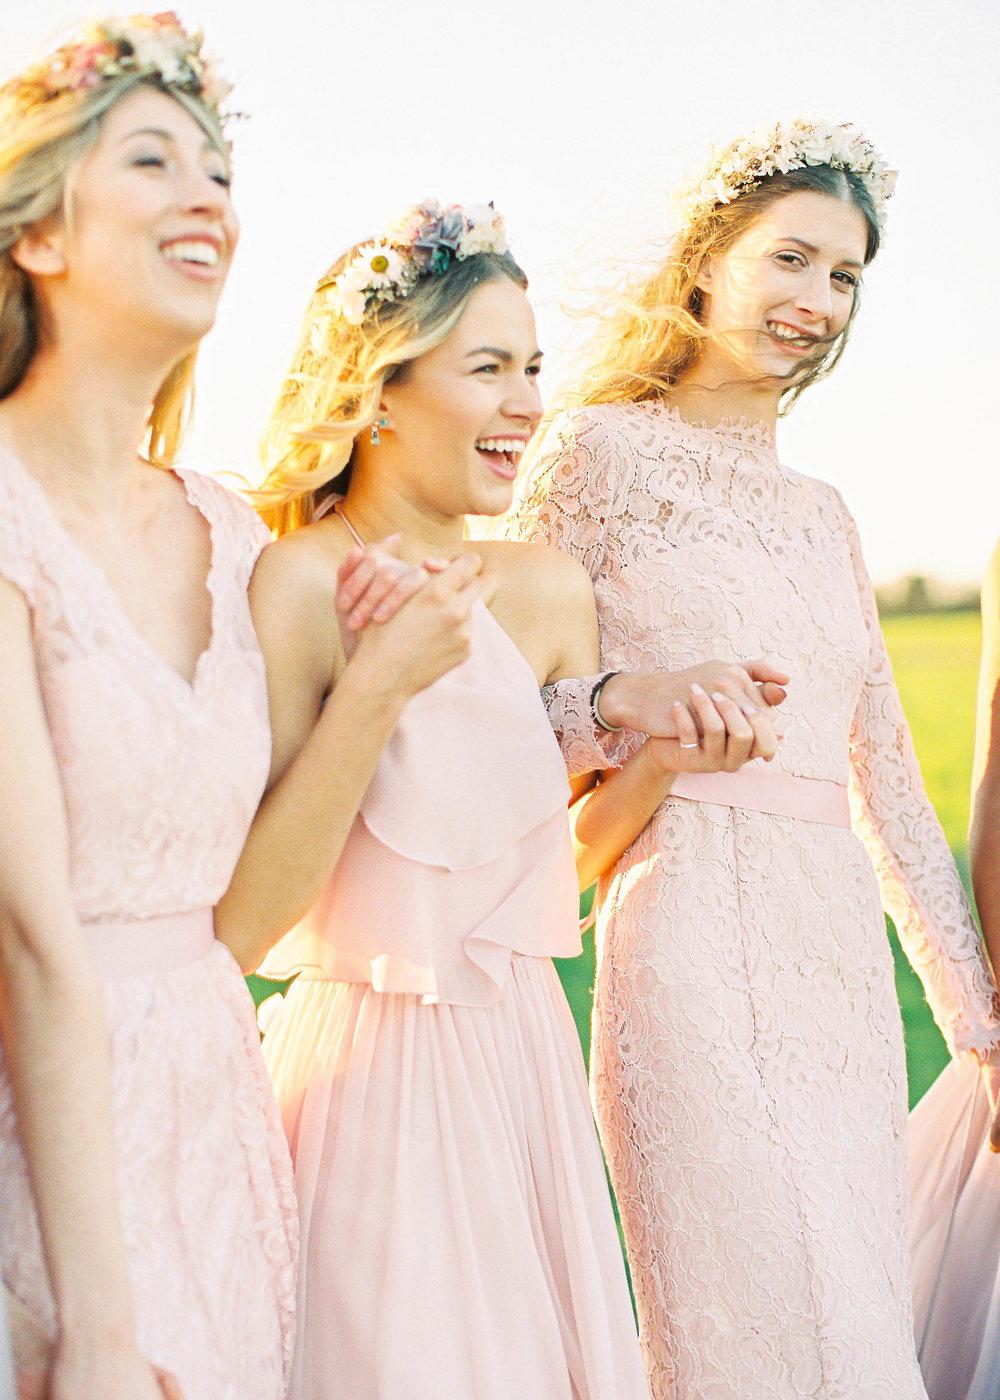 Amy O'Boyle Photography- Destination & UK Fine Art Film Wedding Photographer- TH&TH Bridesmaid Dress Shoot-4.jpg